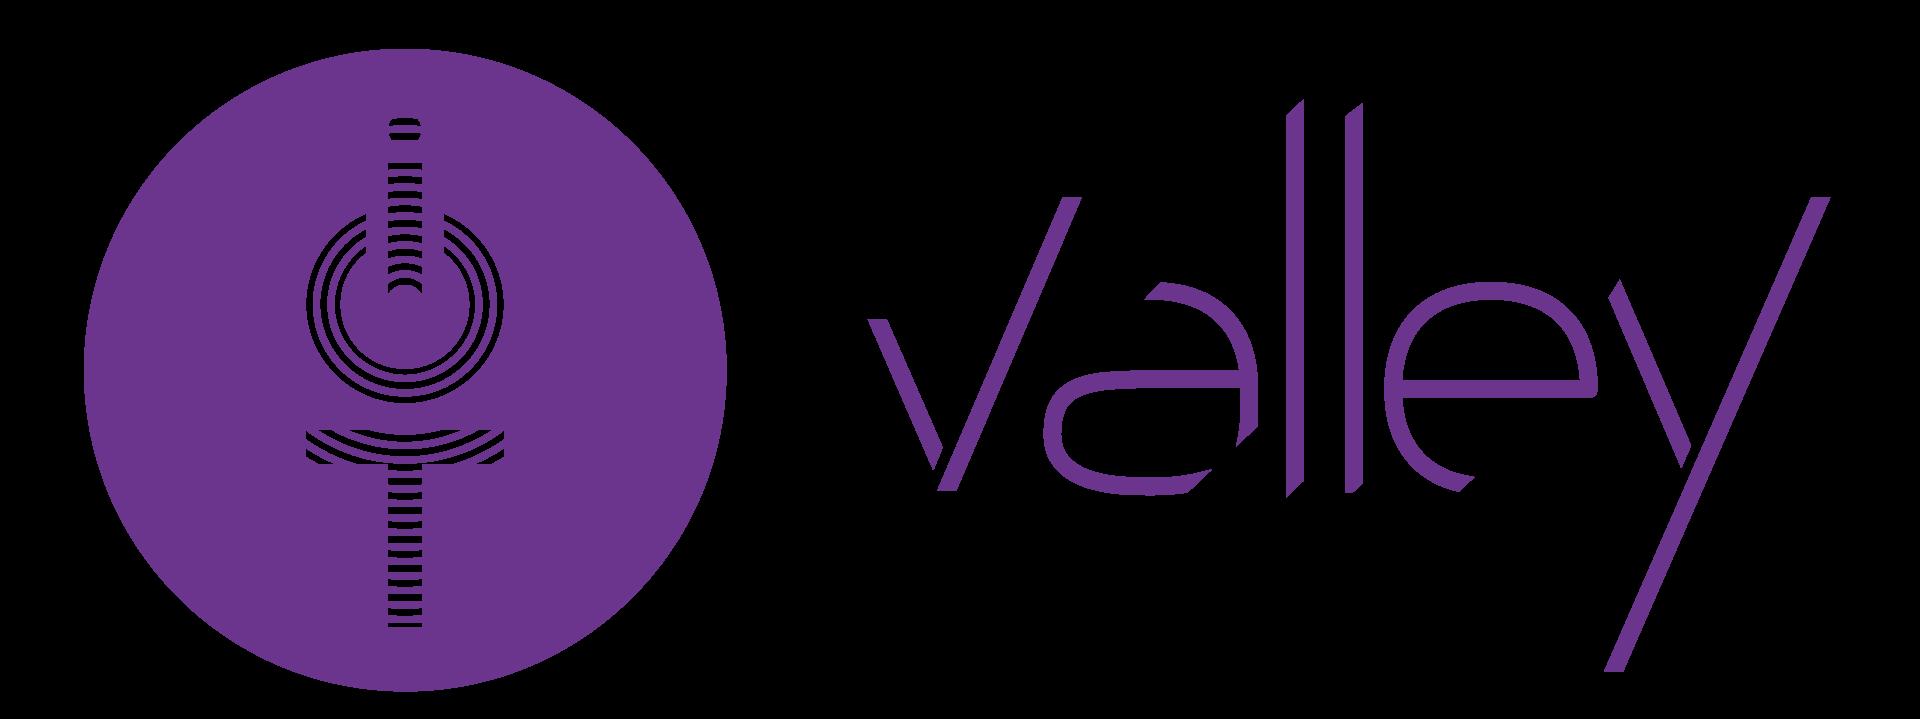 logo_iotvalley_violet